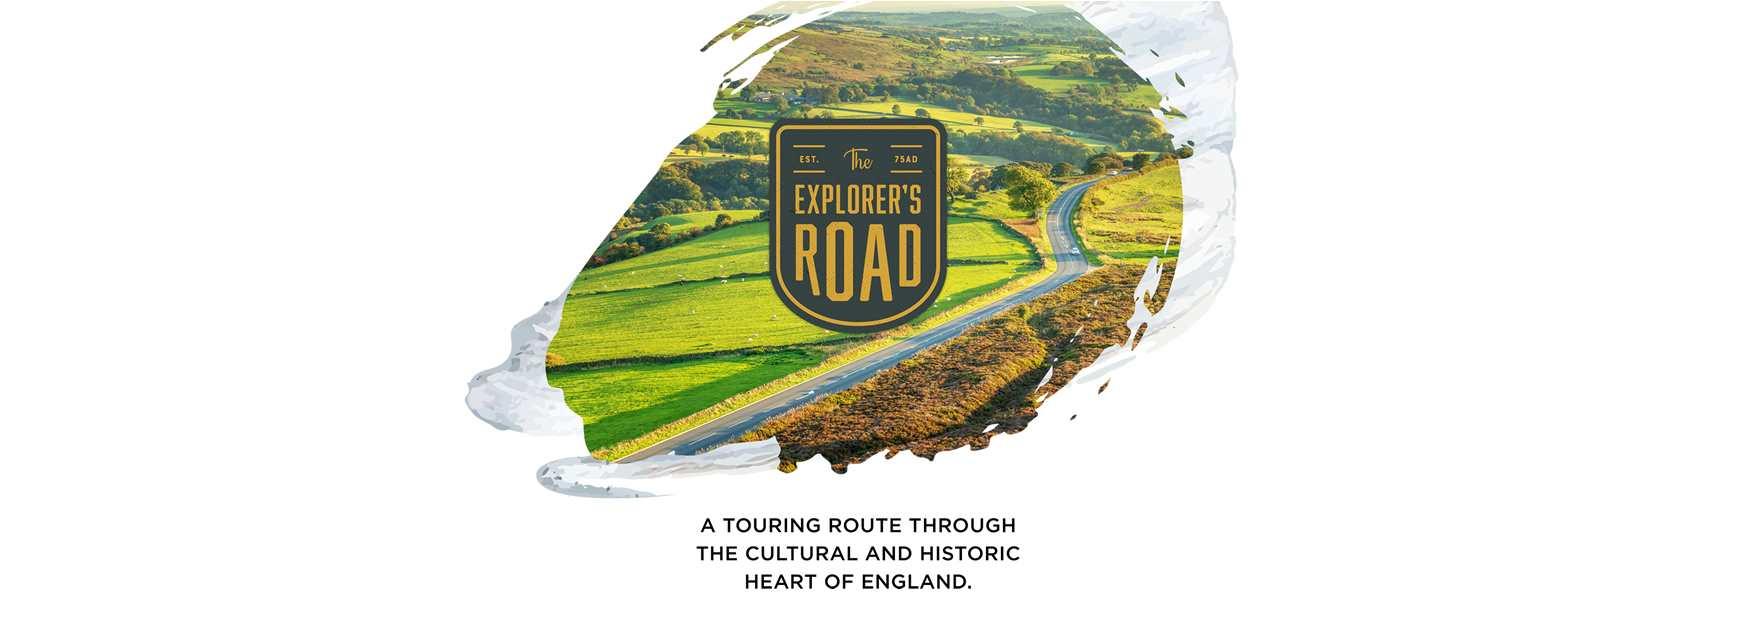 Explorers Road Gallery